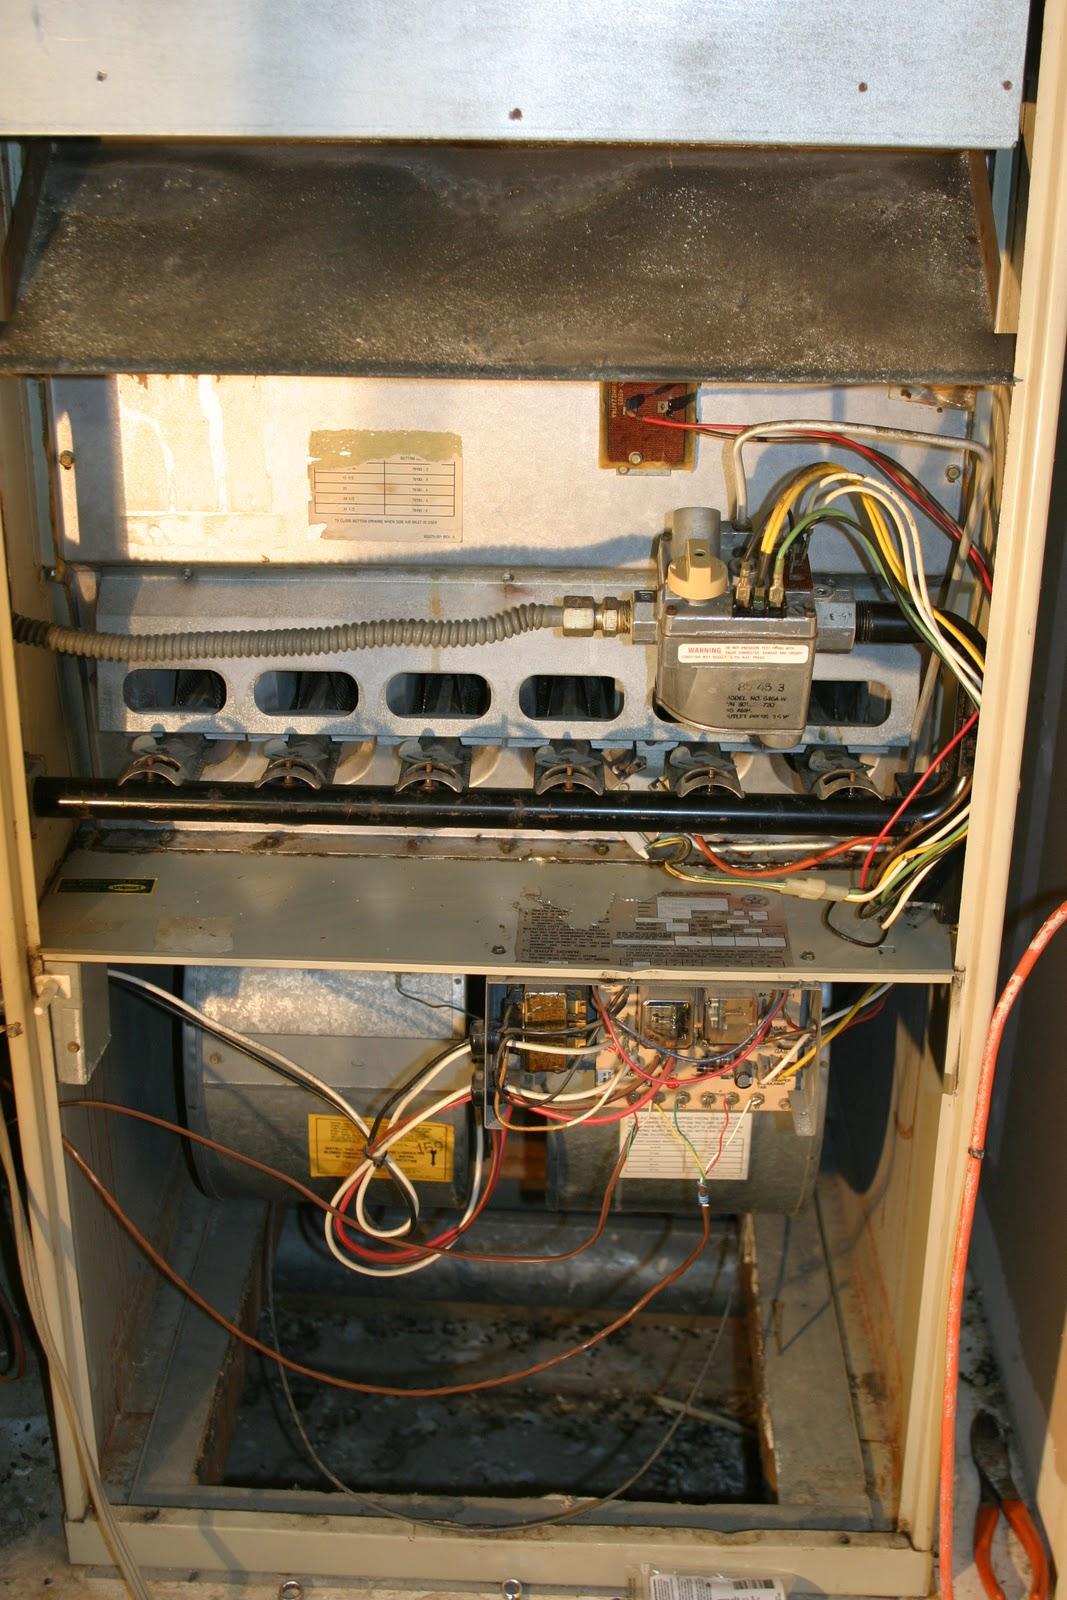 Furnace Blower Humming When Off 97 Club Car Wiring Diagram Fred Leavitt The